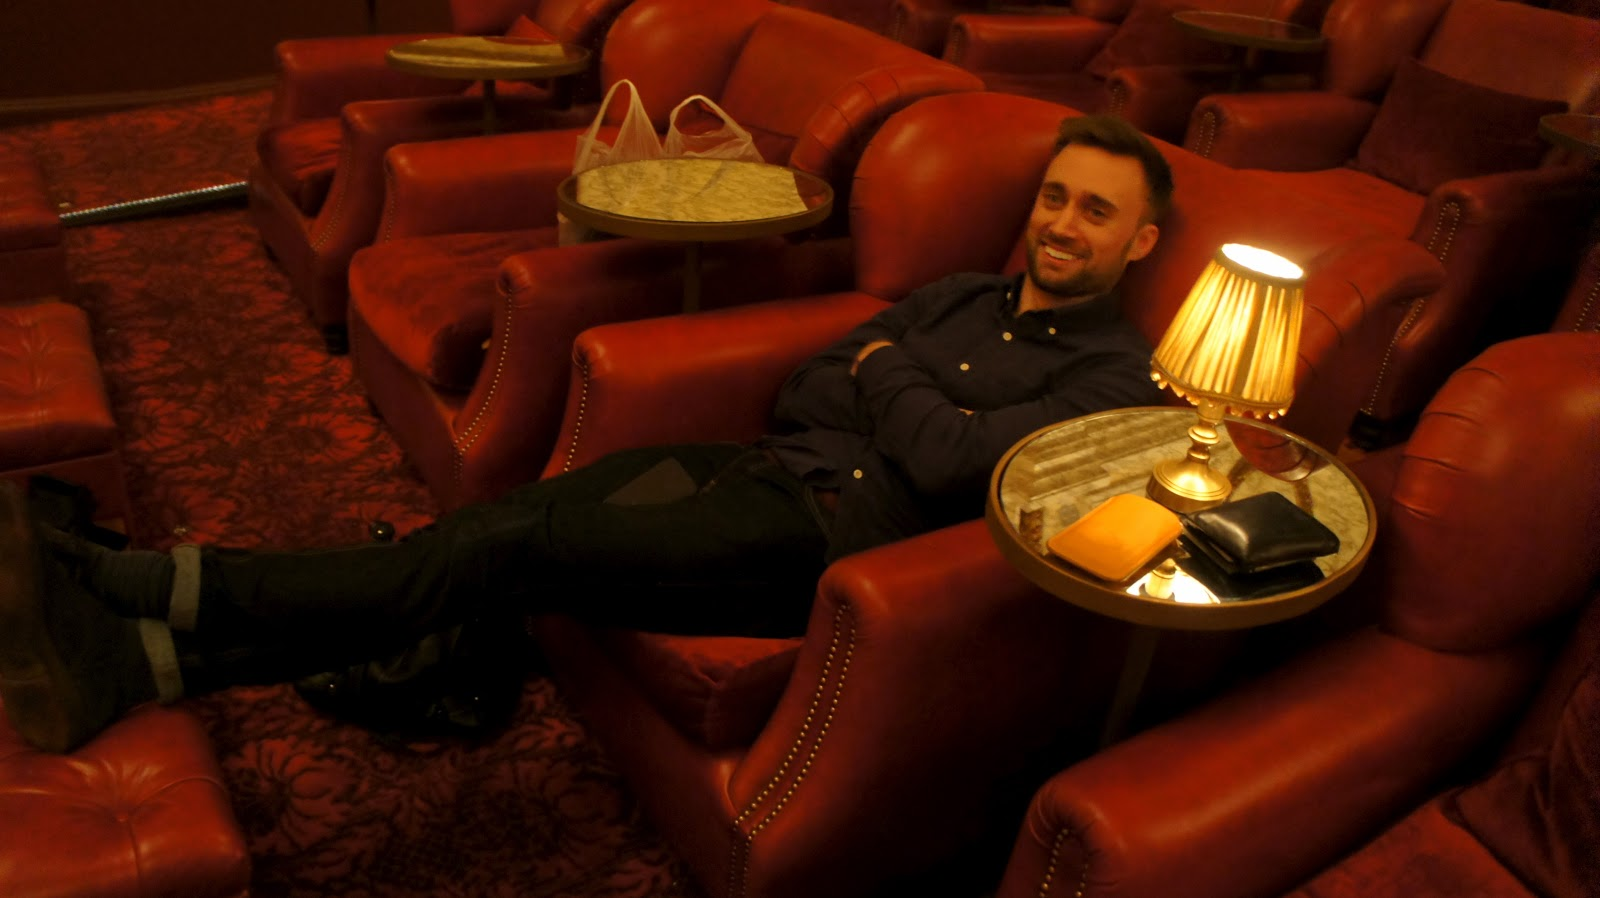 east london sofa cinema fundas de peru the electric  notting hill we food snobs